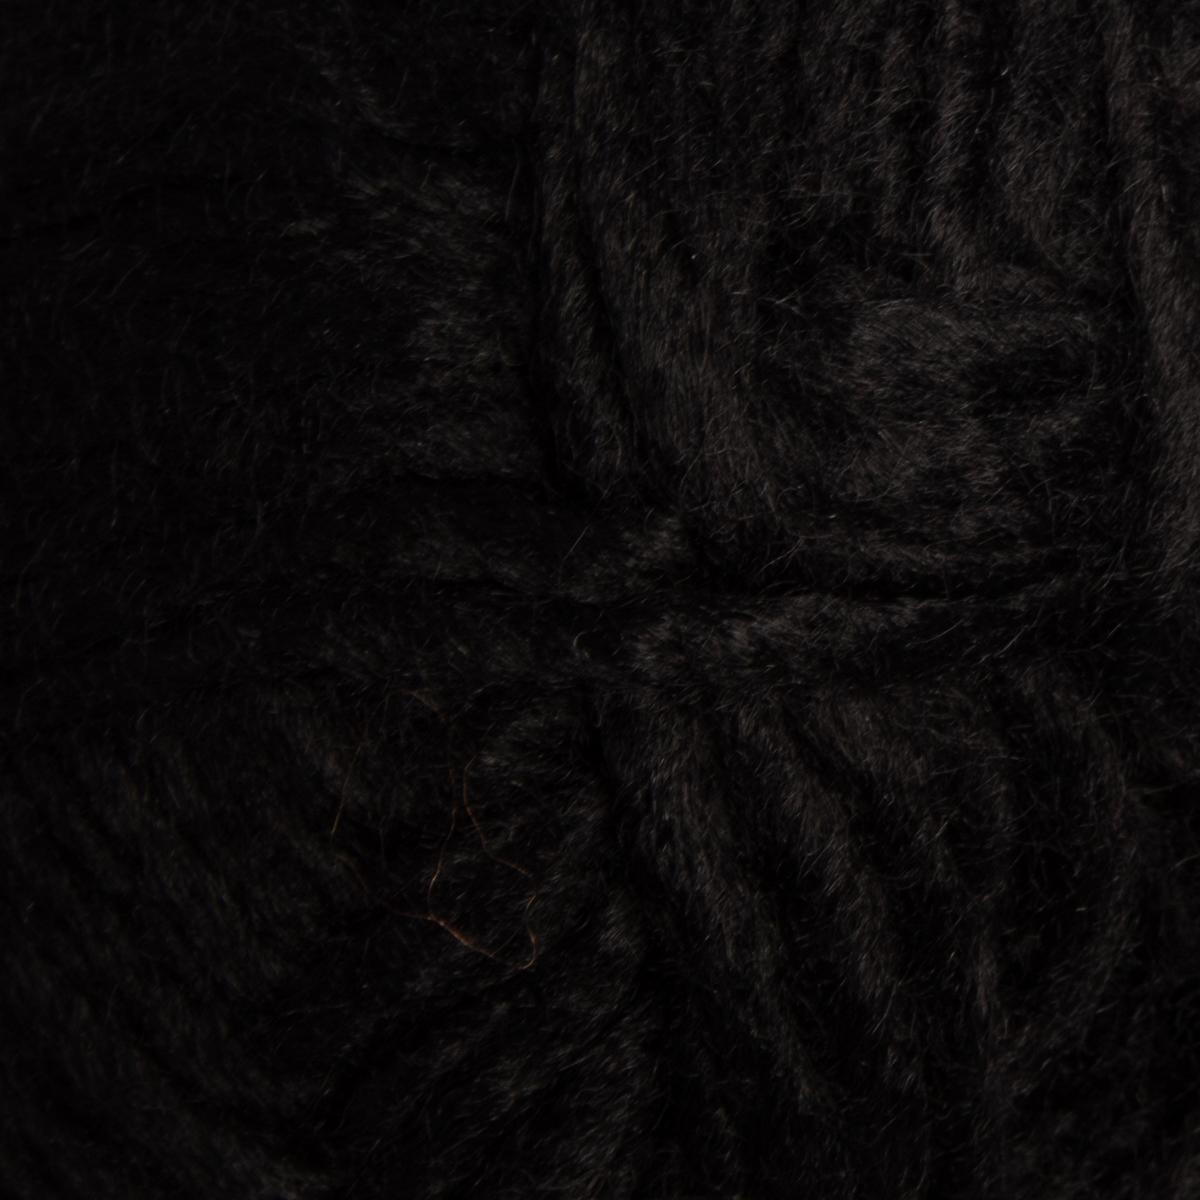 3pk-Lion-Brand-New-Basic-Acrylic-amp-Wool-Yarn-Medium-4-Knit-Crochet-Skeins-Soft thumbnail 15